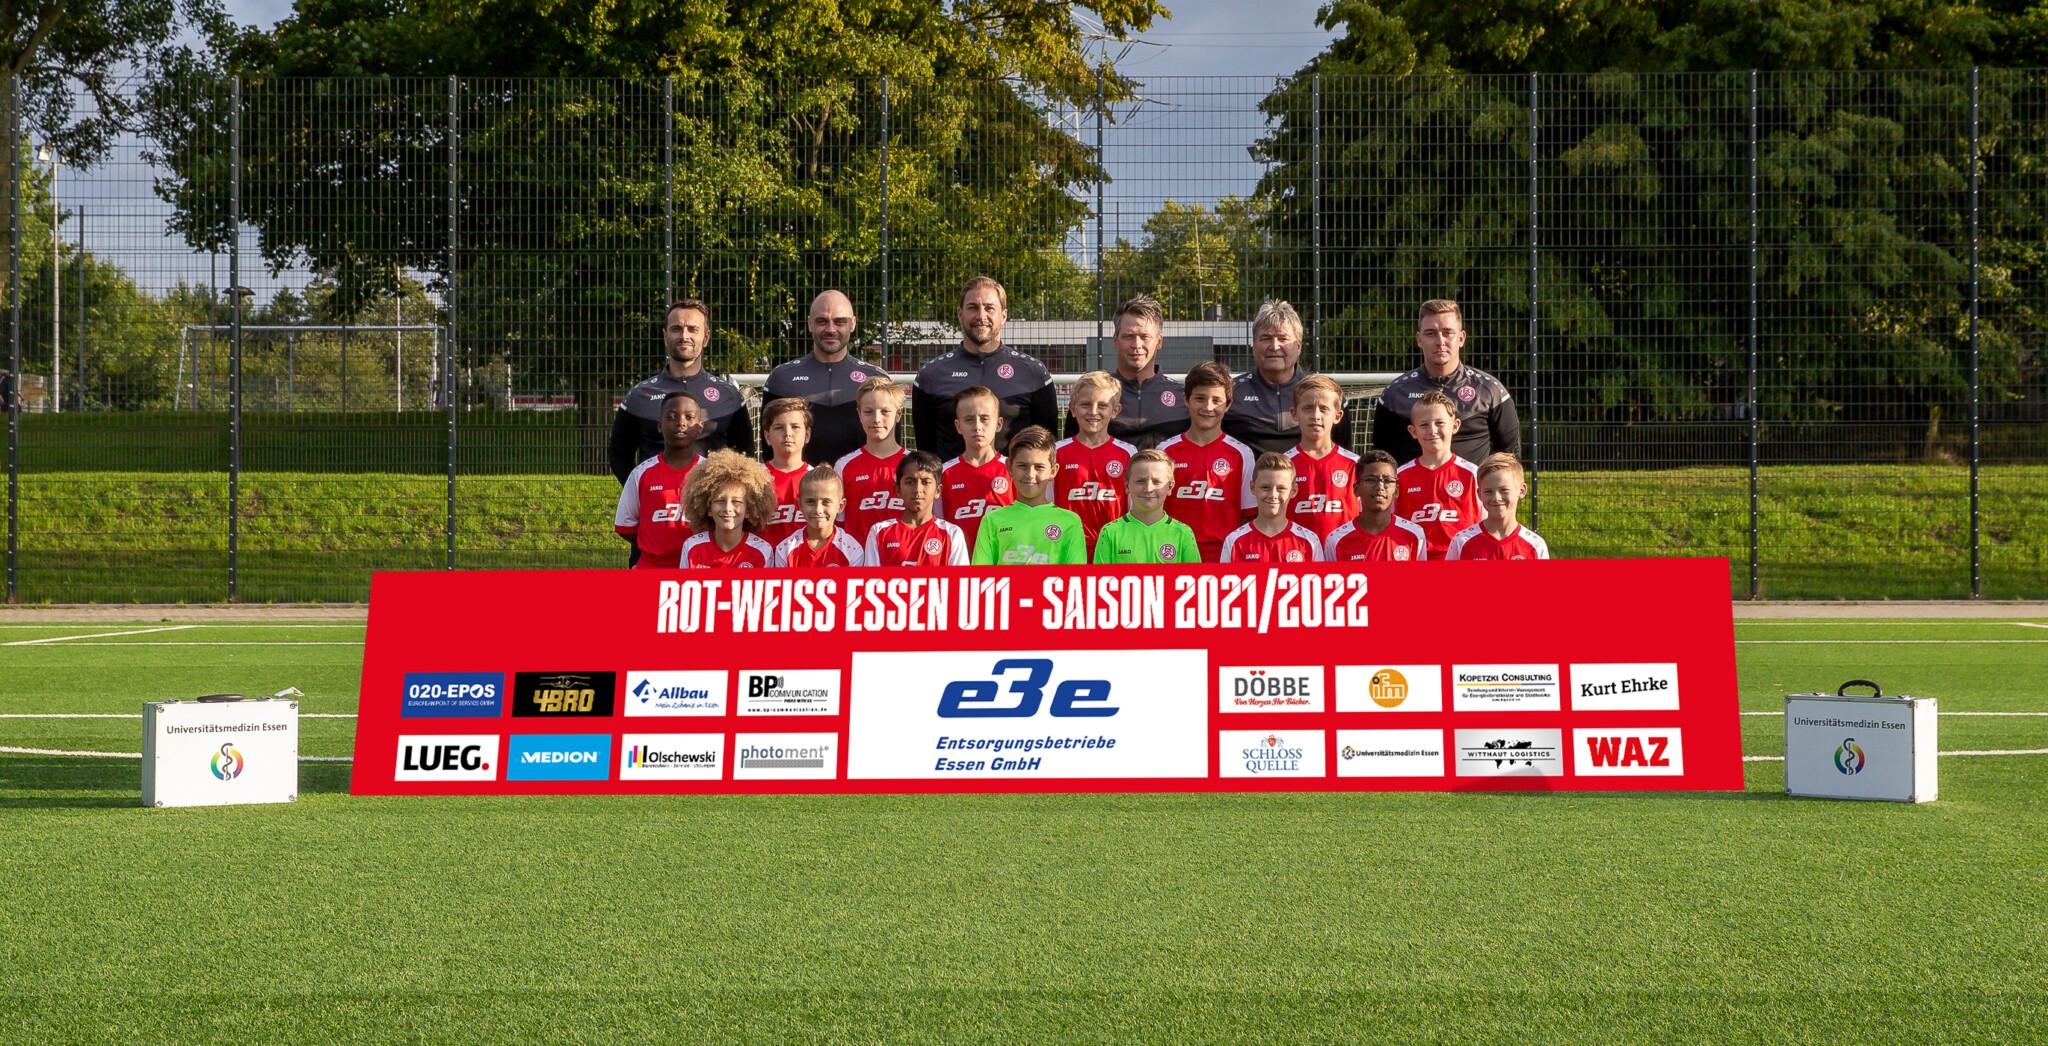 U11 – Rot-Weiss Essen